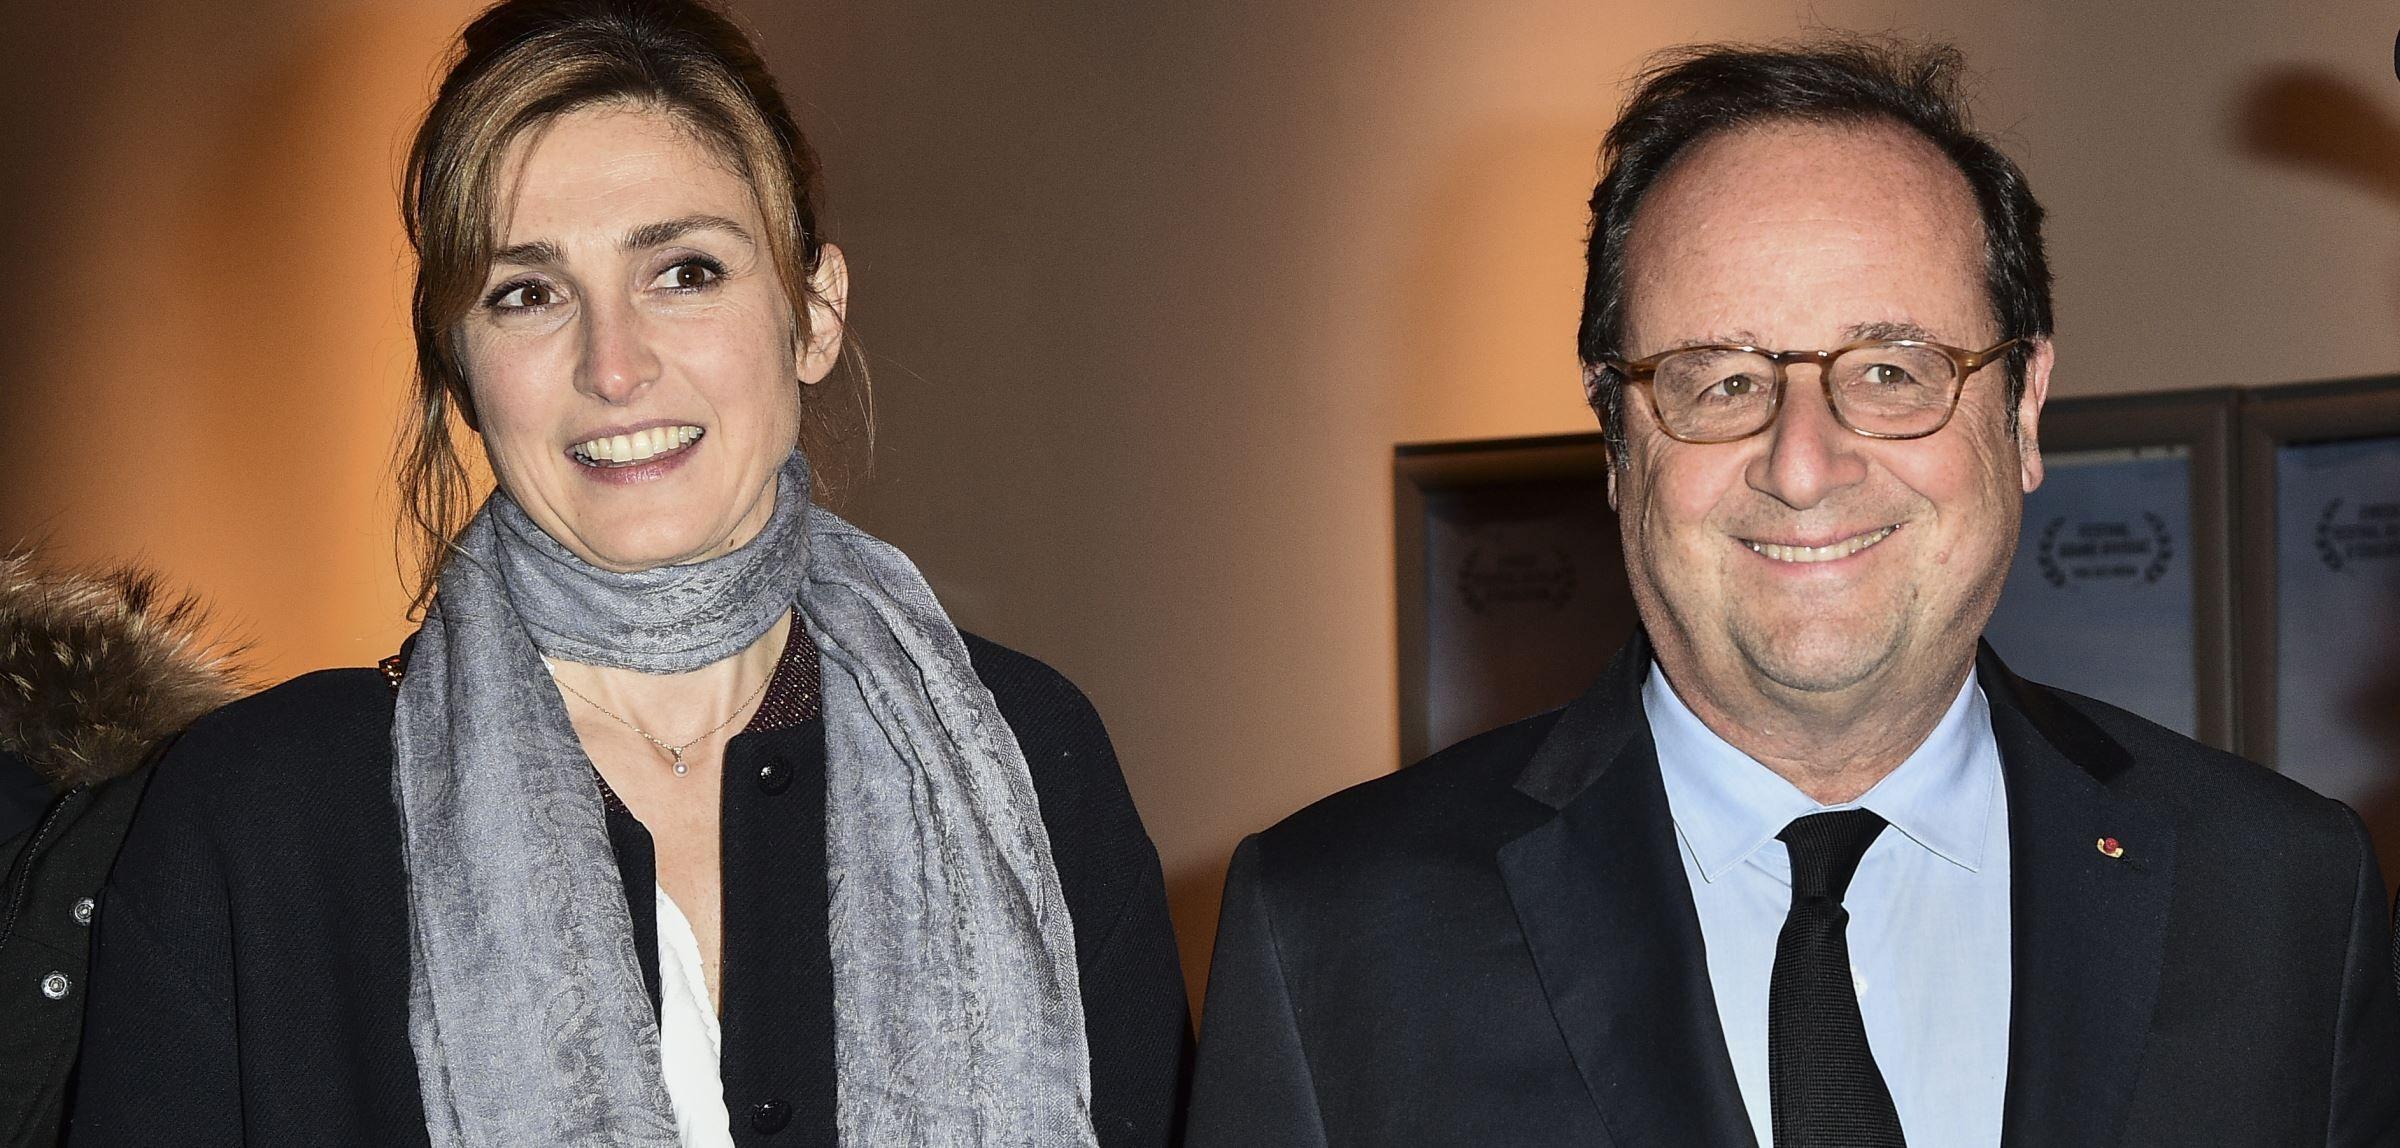 François Hollande et Julie Gayet le mystère de leur relation